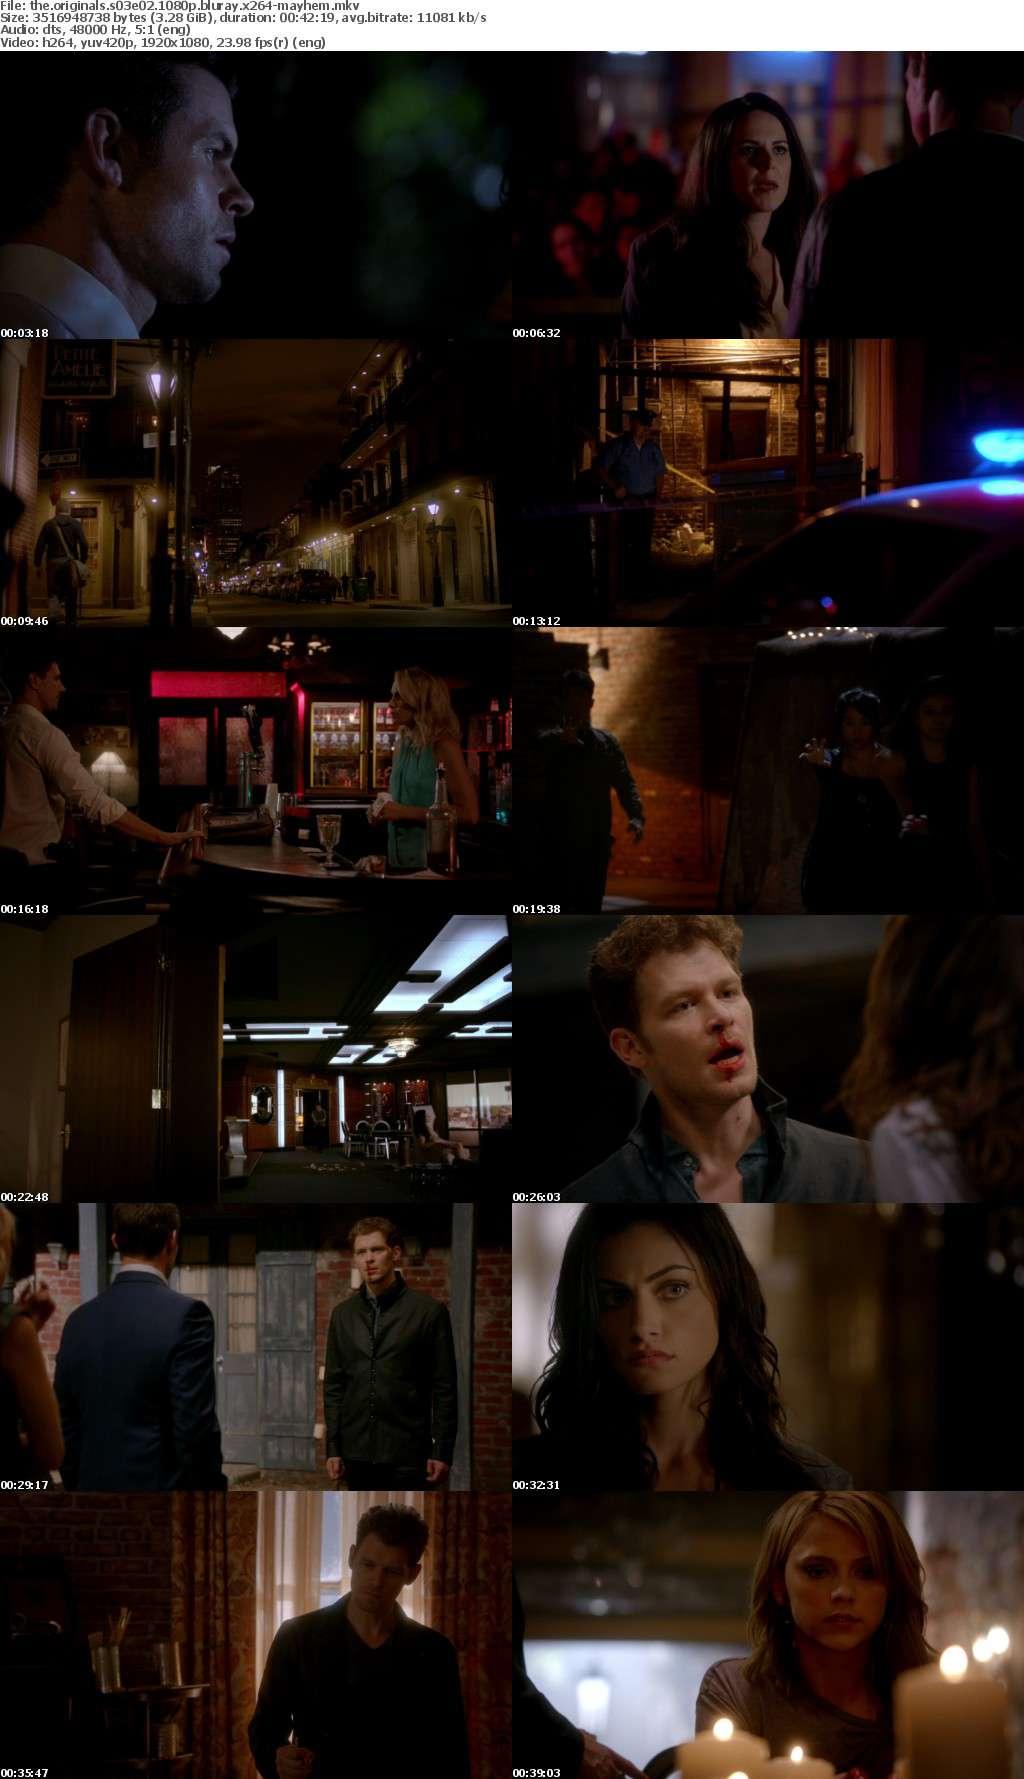 The Originals S03E02 1080p BluRay x264-MAYHEM